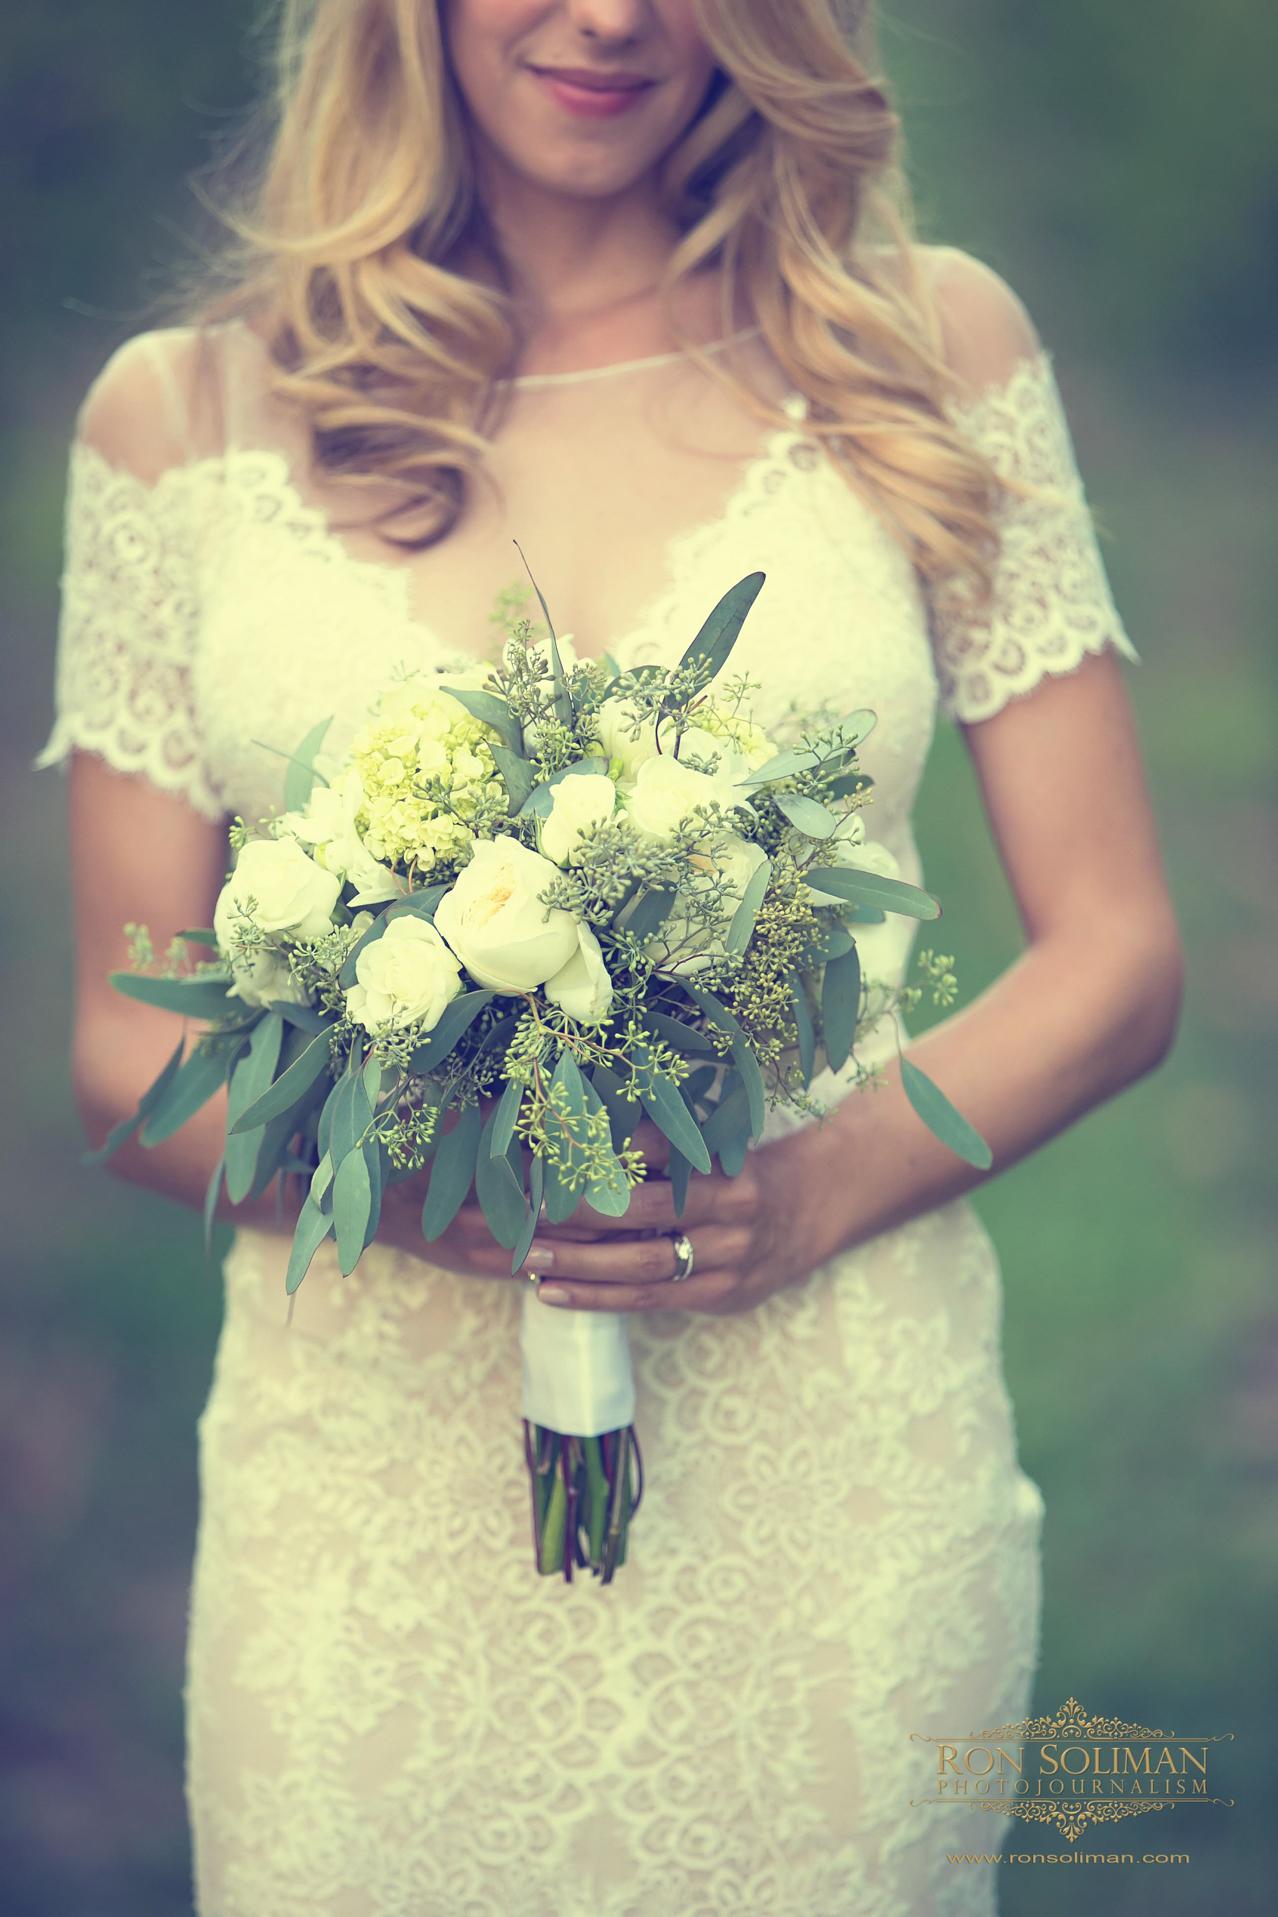 Ginny Lee Wagner Vineyards Wedding photos